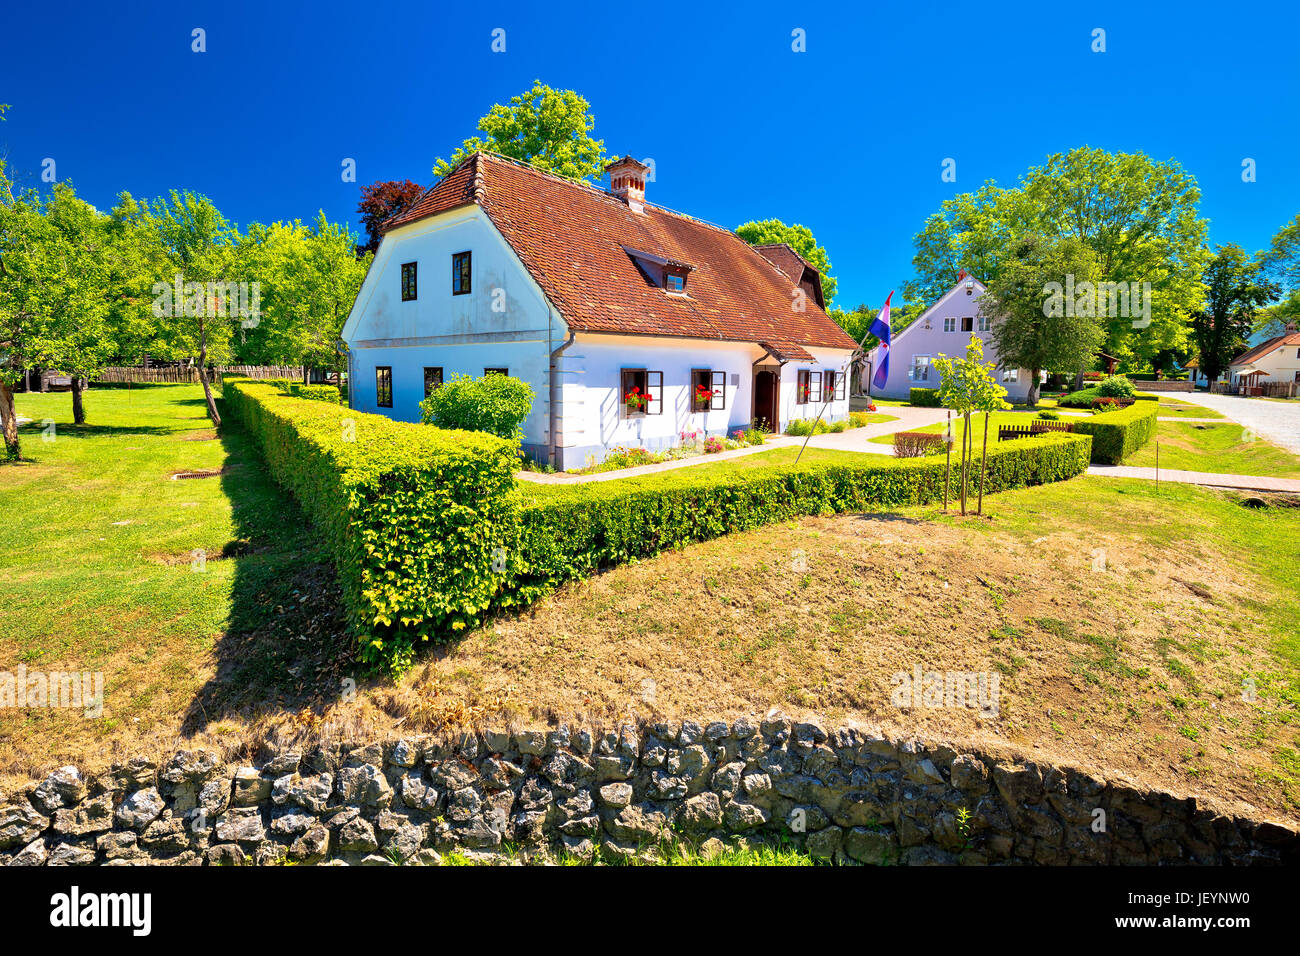 Village of Kumrovec and Josip Broz Tito birth house view, Zagorje region of Croatia Stock Photo